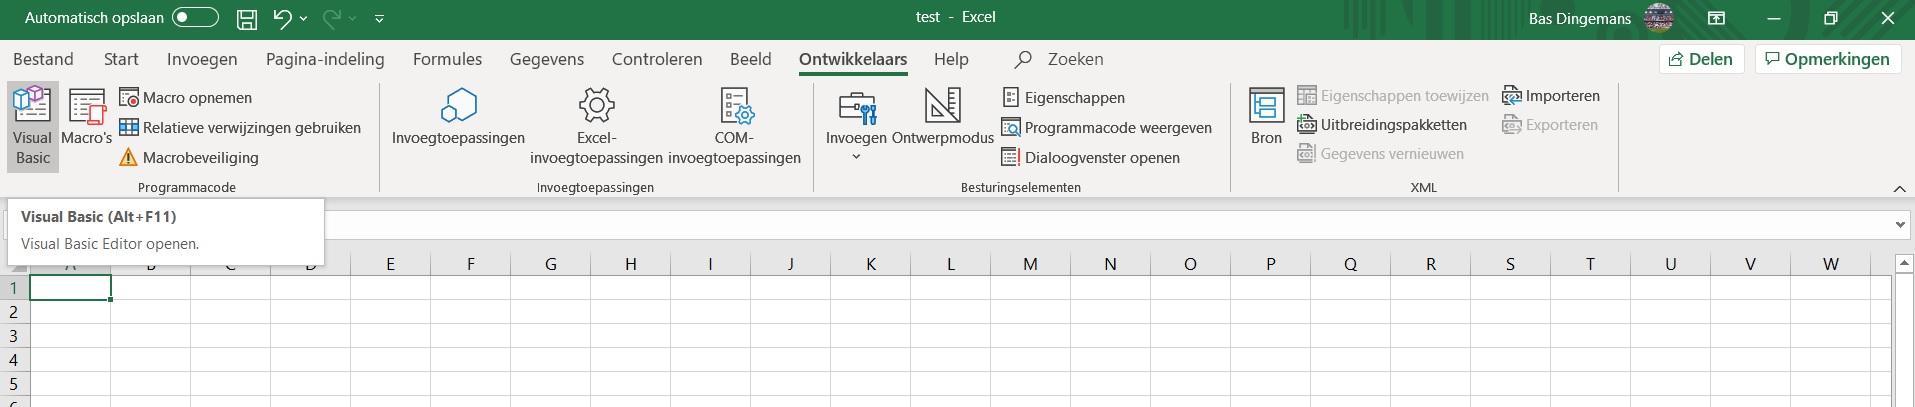 Open Visual Basic Editor in het lint in Excel